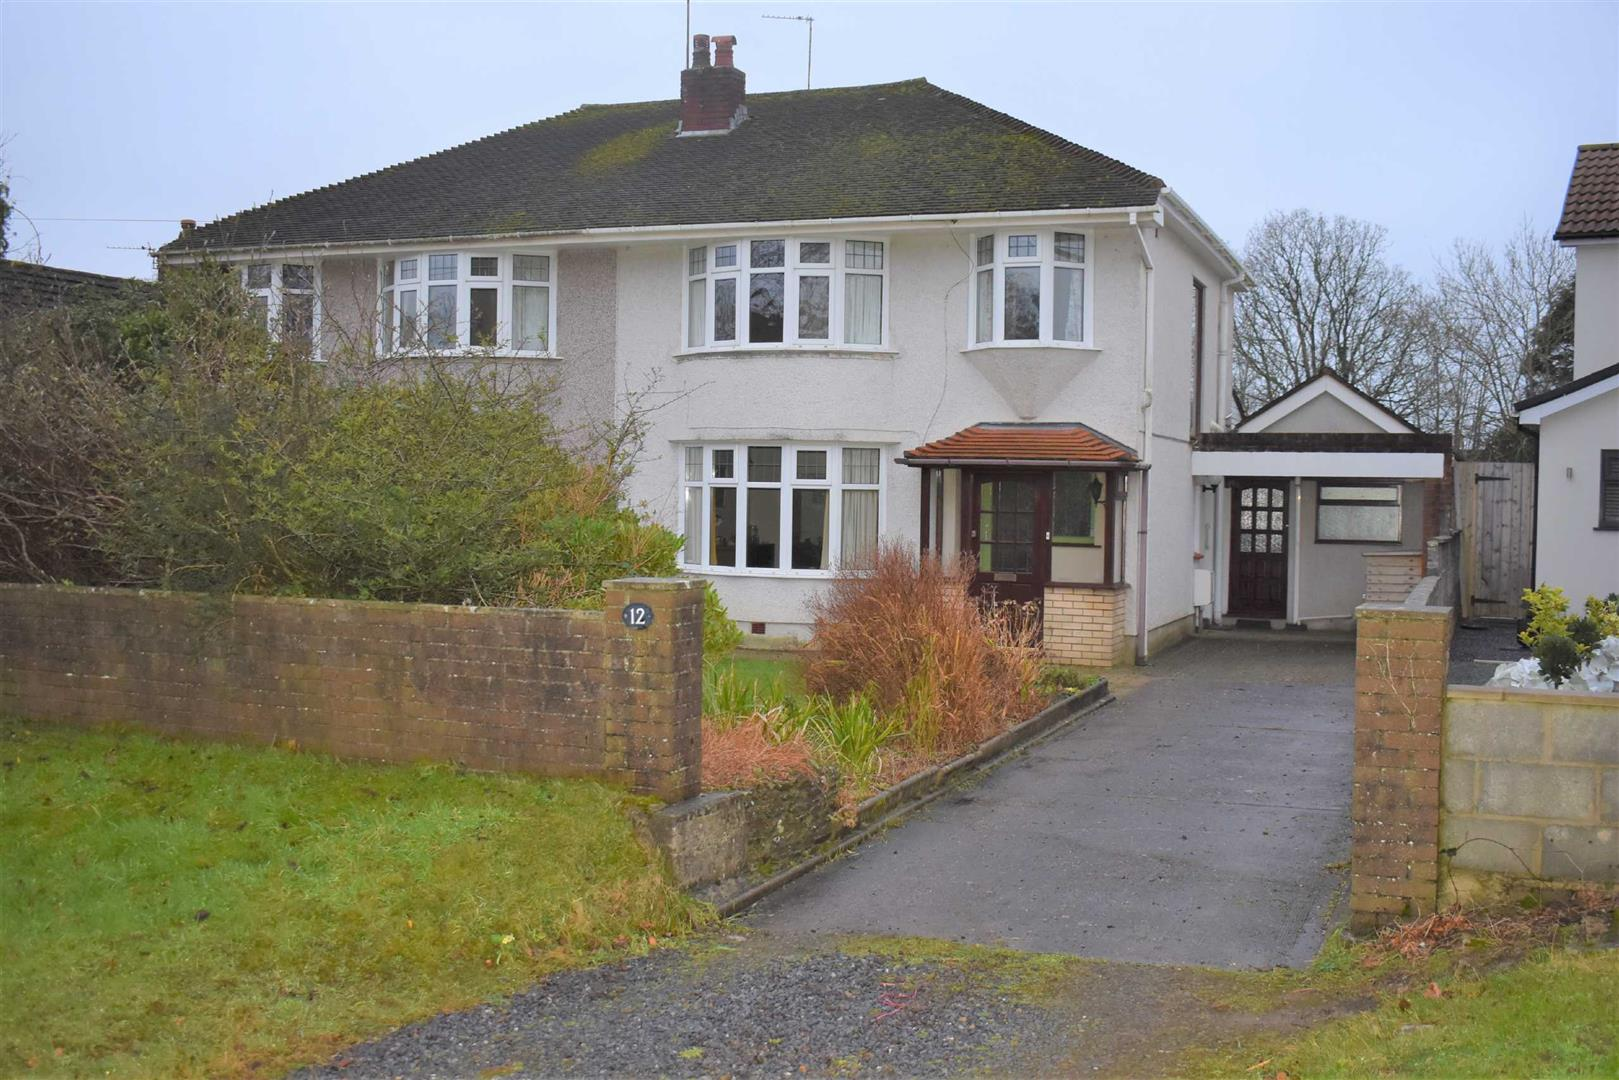 Highpool Lane, Newton, Swansea, SA3 4TT